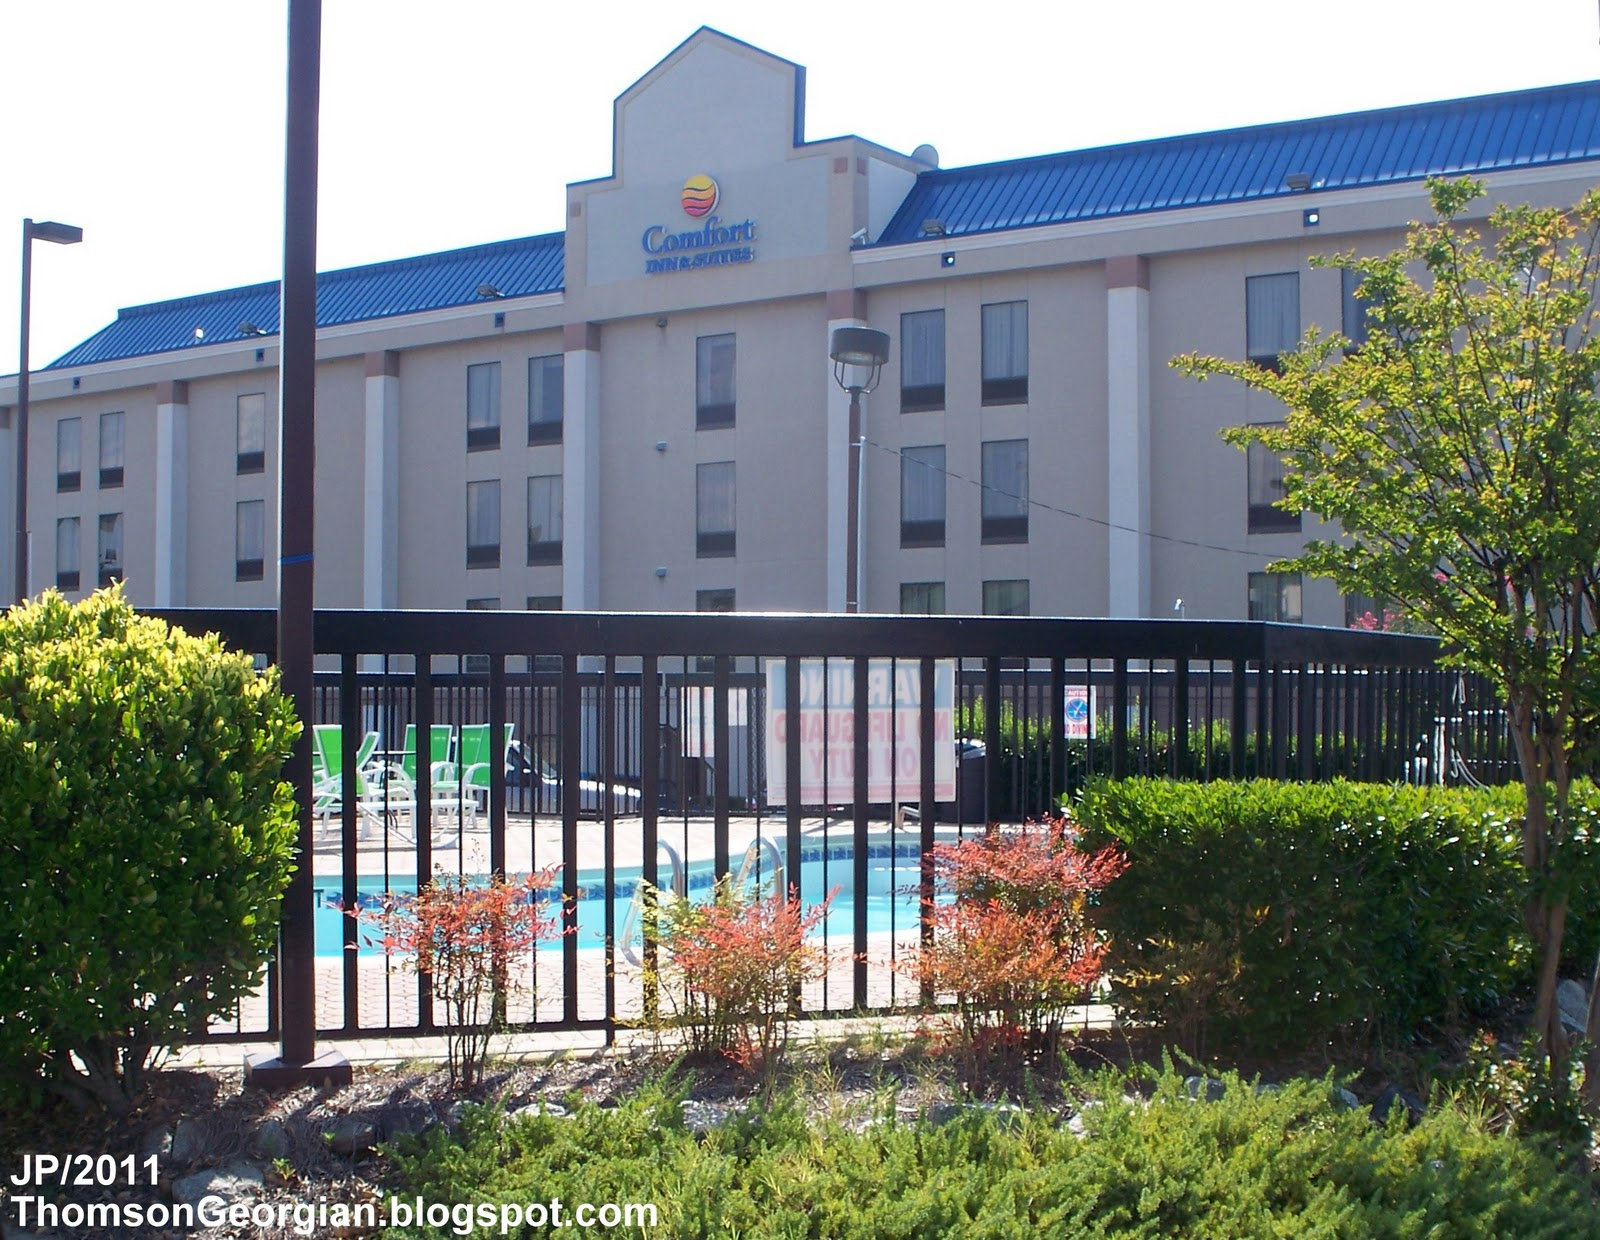 Comfort Inn Suites Hotel Thomson Georgia Washington Road Lodging Mcduffie County Ga